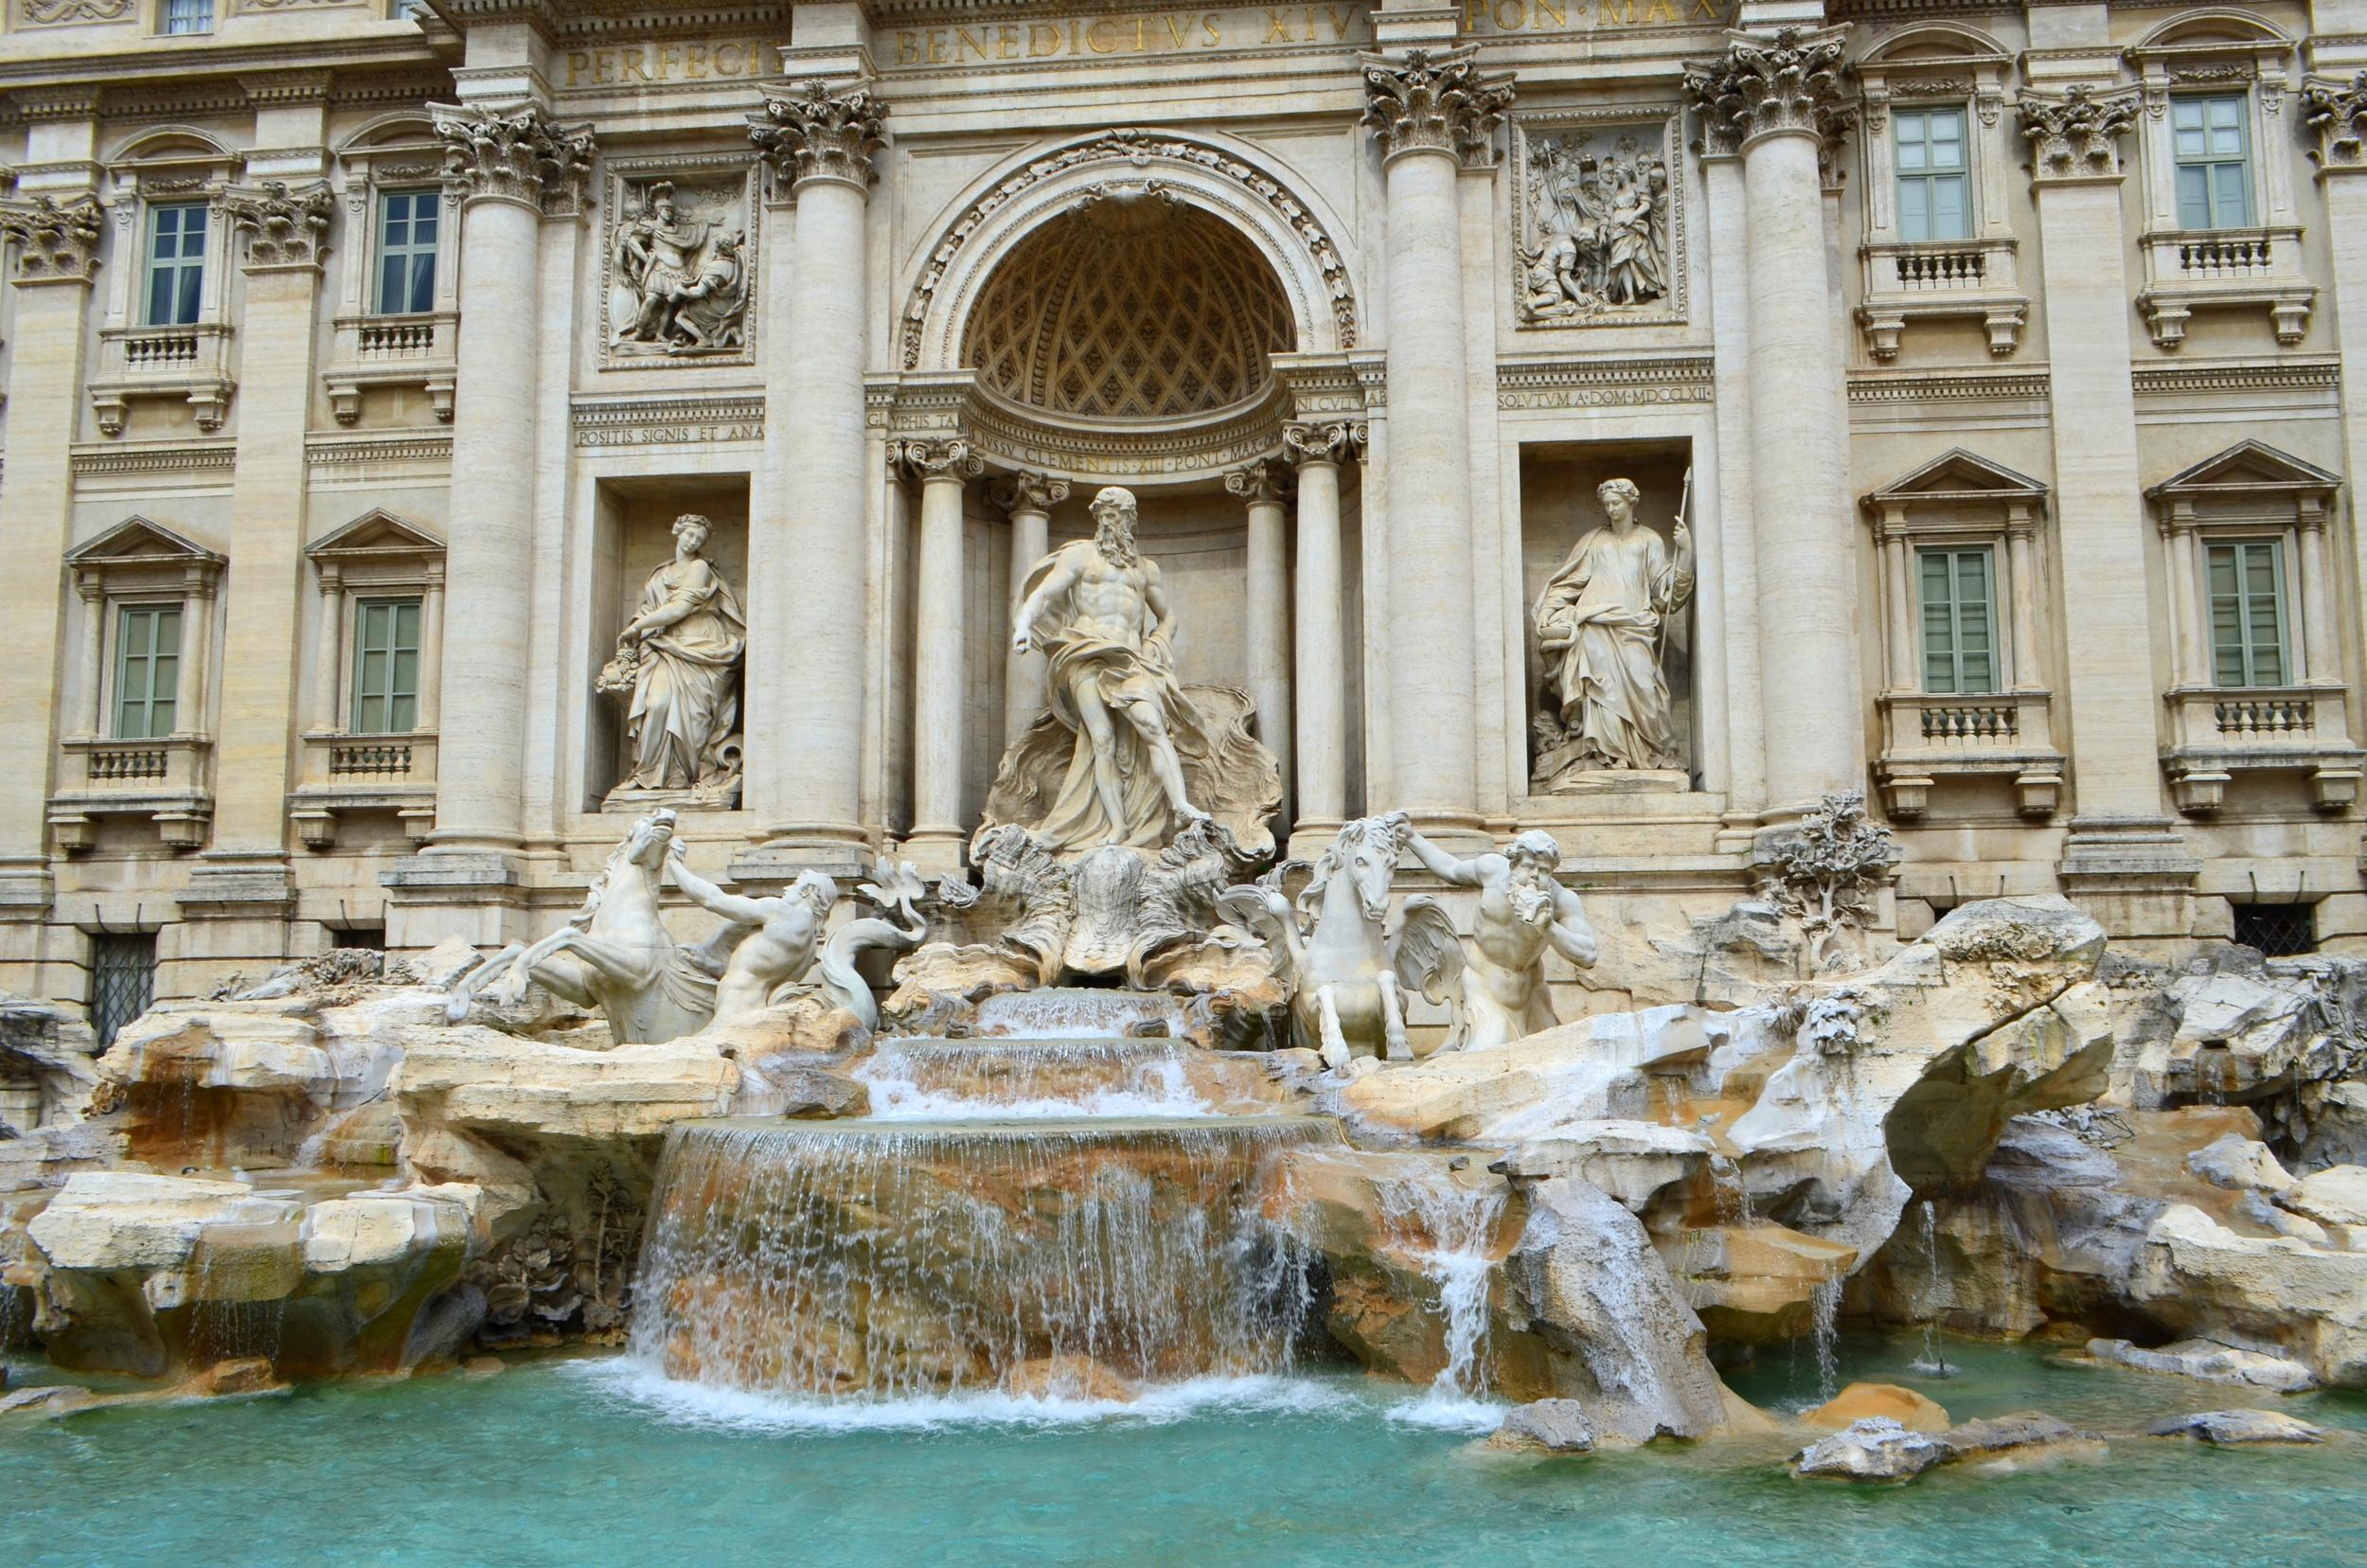 Live Like You're Traveling: Live La Dolce Vita